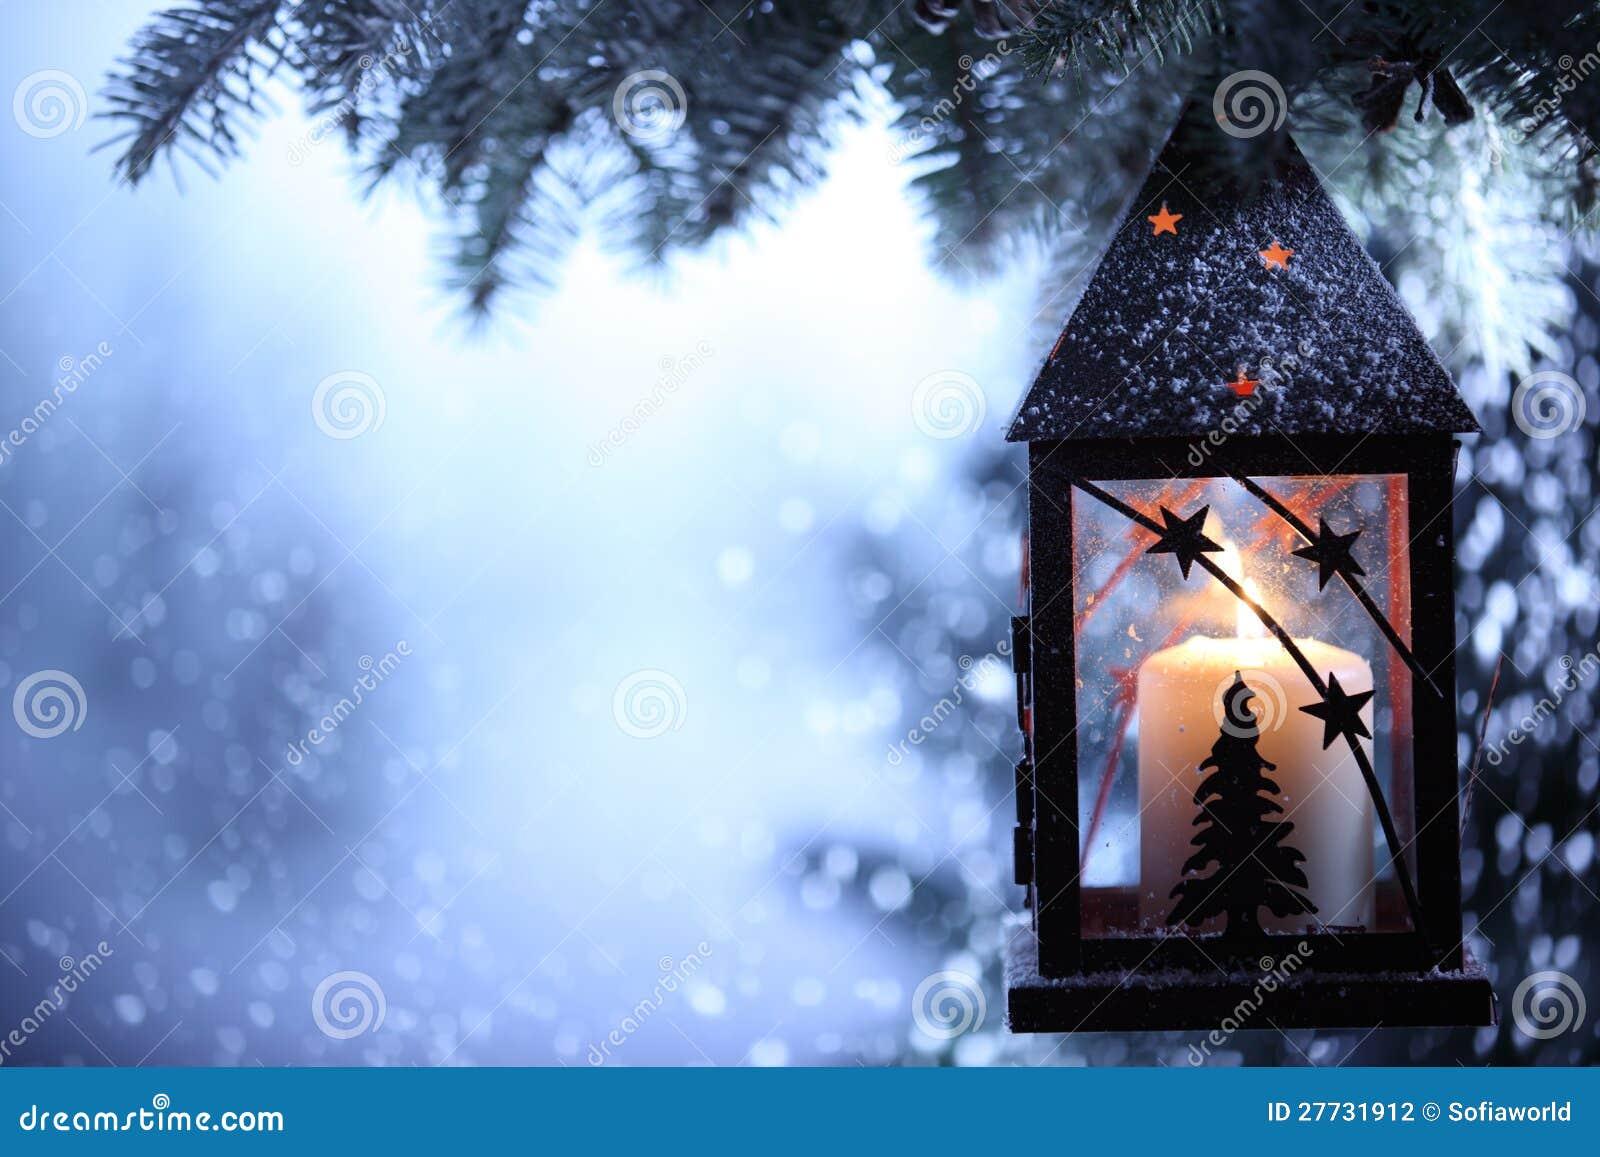 lanterne de no l photographie stock image 27731912. Black Bedroom Furniture Sets. Home Design Ideas